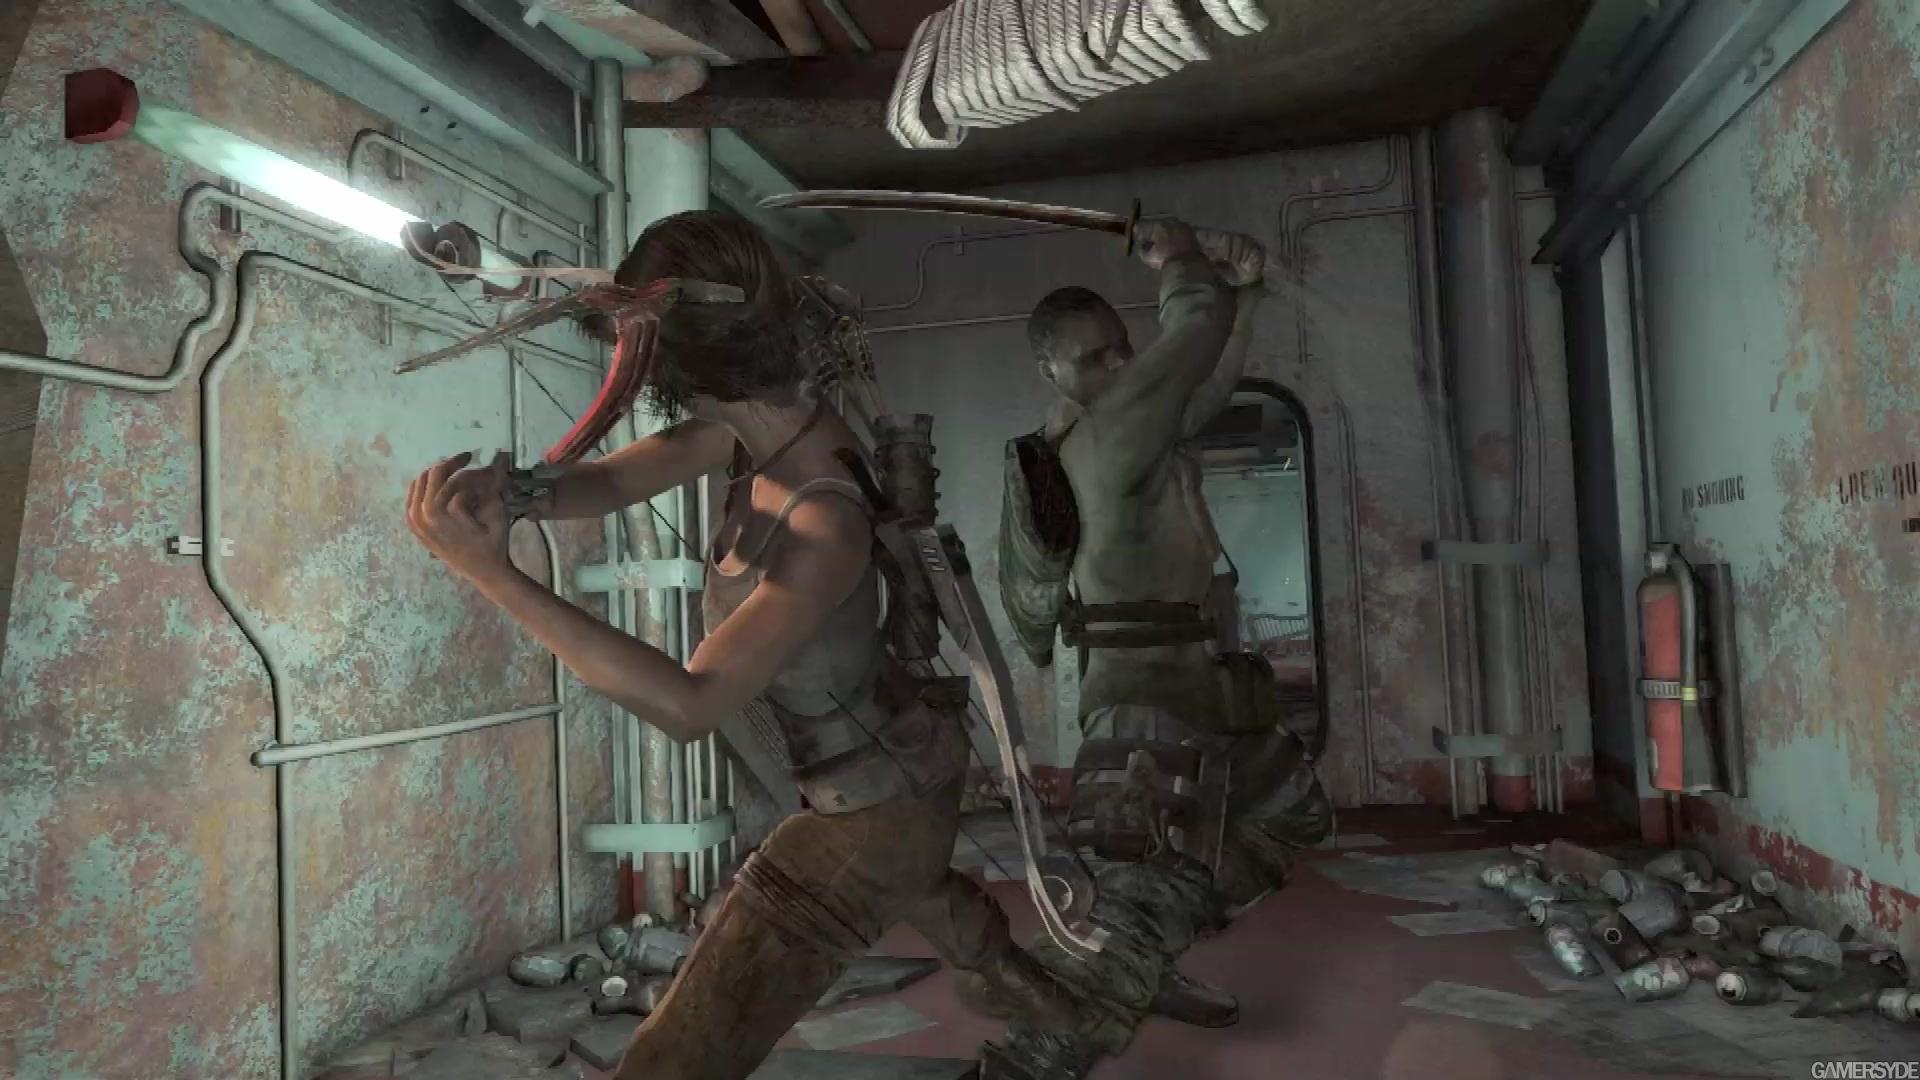 image tomb raider 24052 1912 0011 تصاویر جدیدی از عنوان Tomb Raider: Definitive Edition منتشر شد